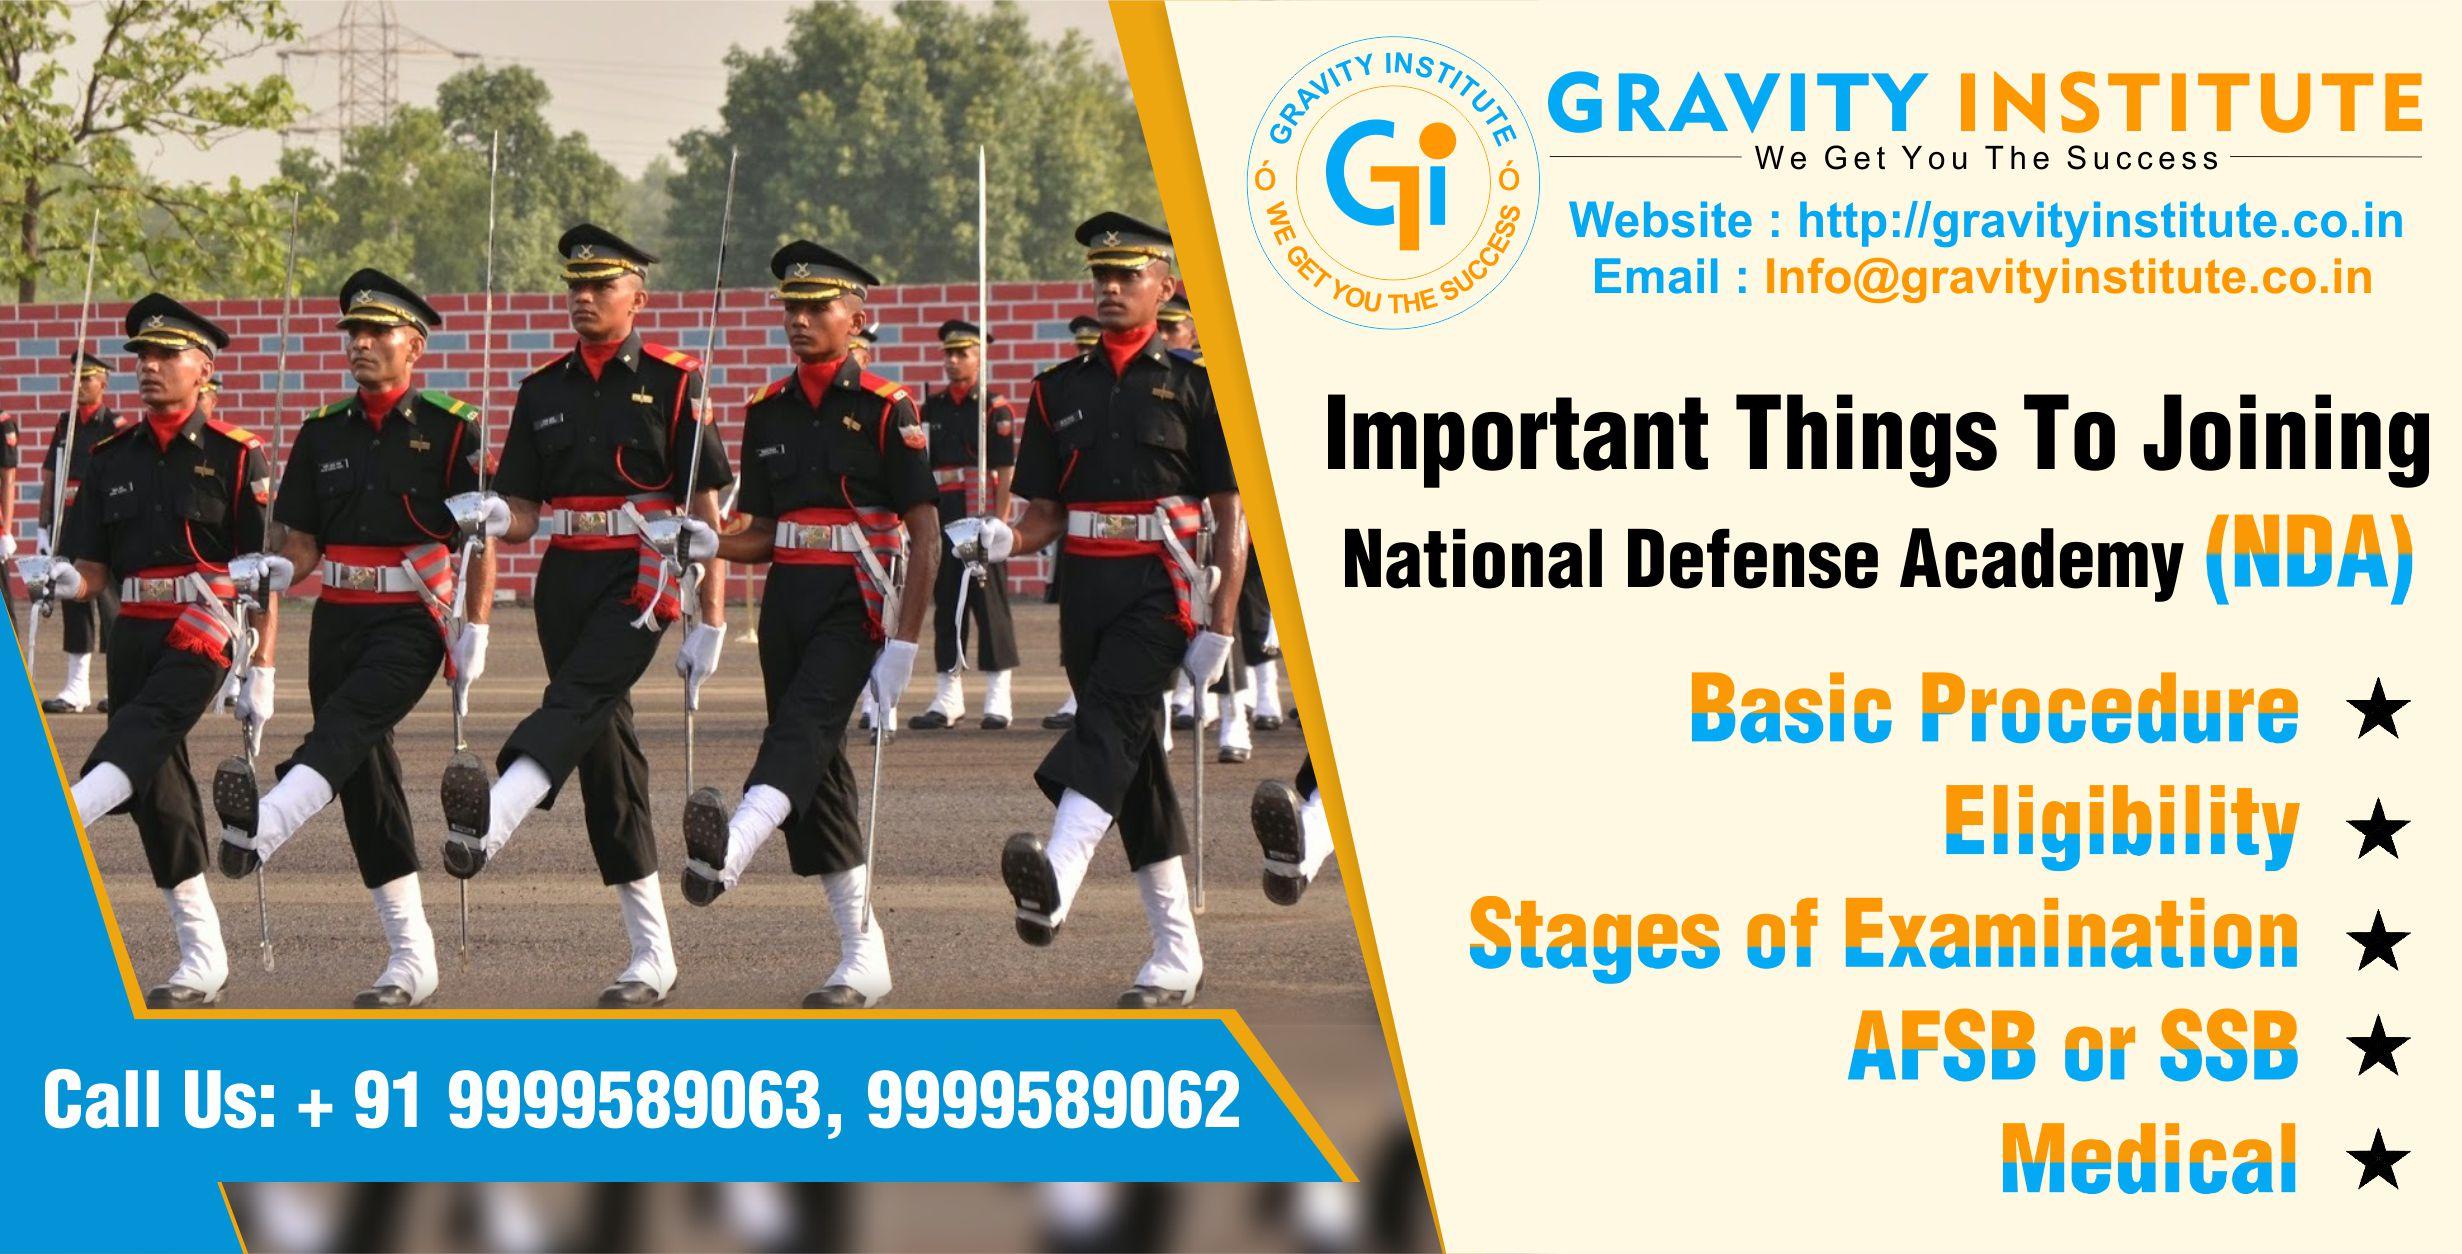 Joining-National-Defense-Academy-NDA